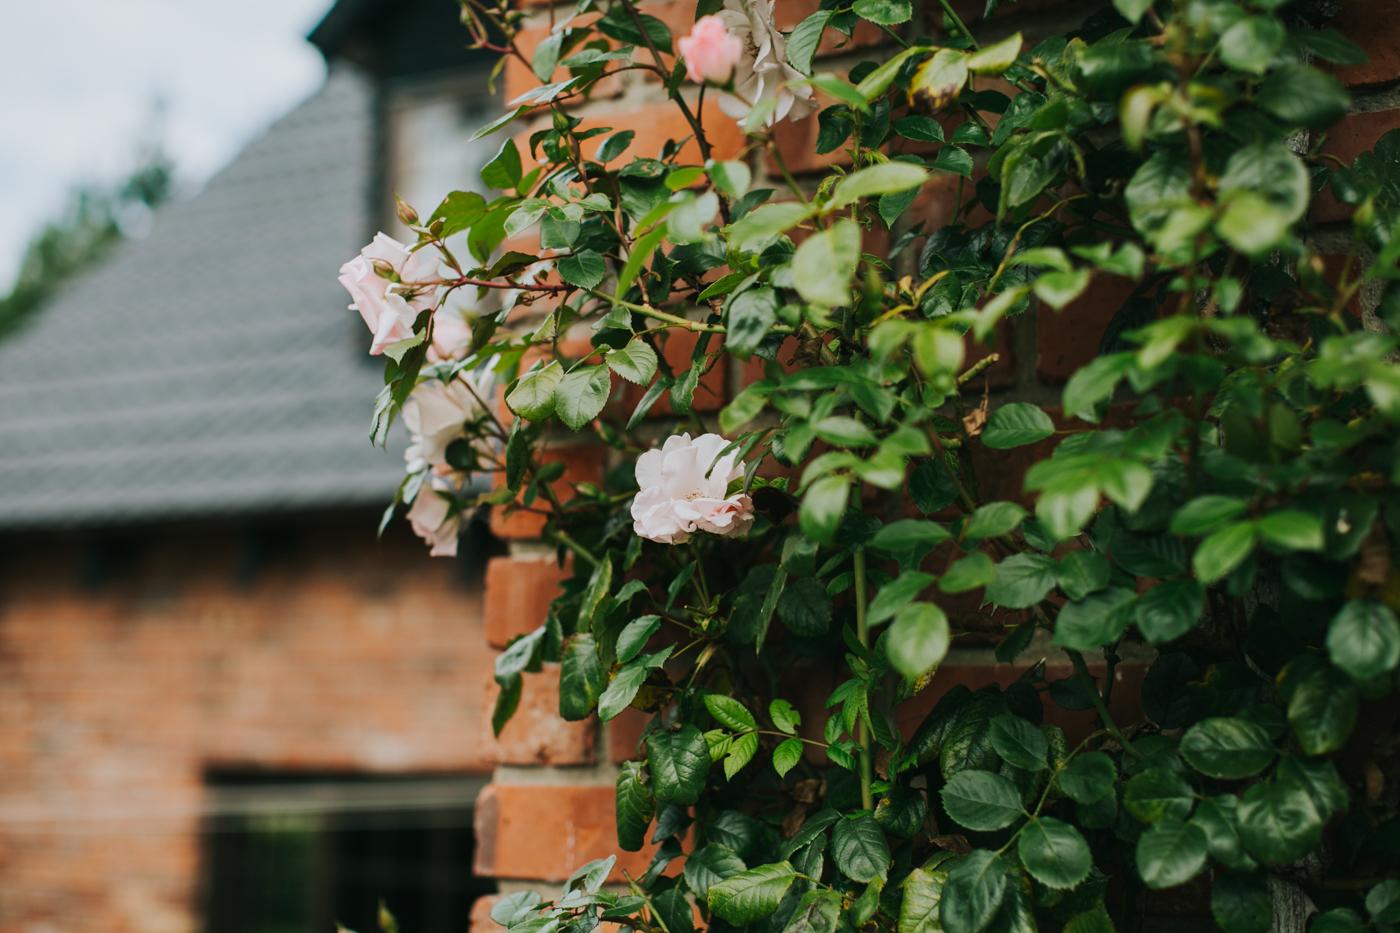 Ariana & Tim - Dunedin, New Zealand Wedding - Destination Wedding - Samantha Heather Photography-71.jpg